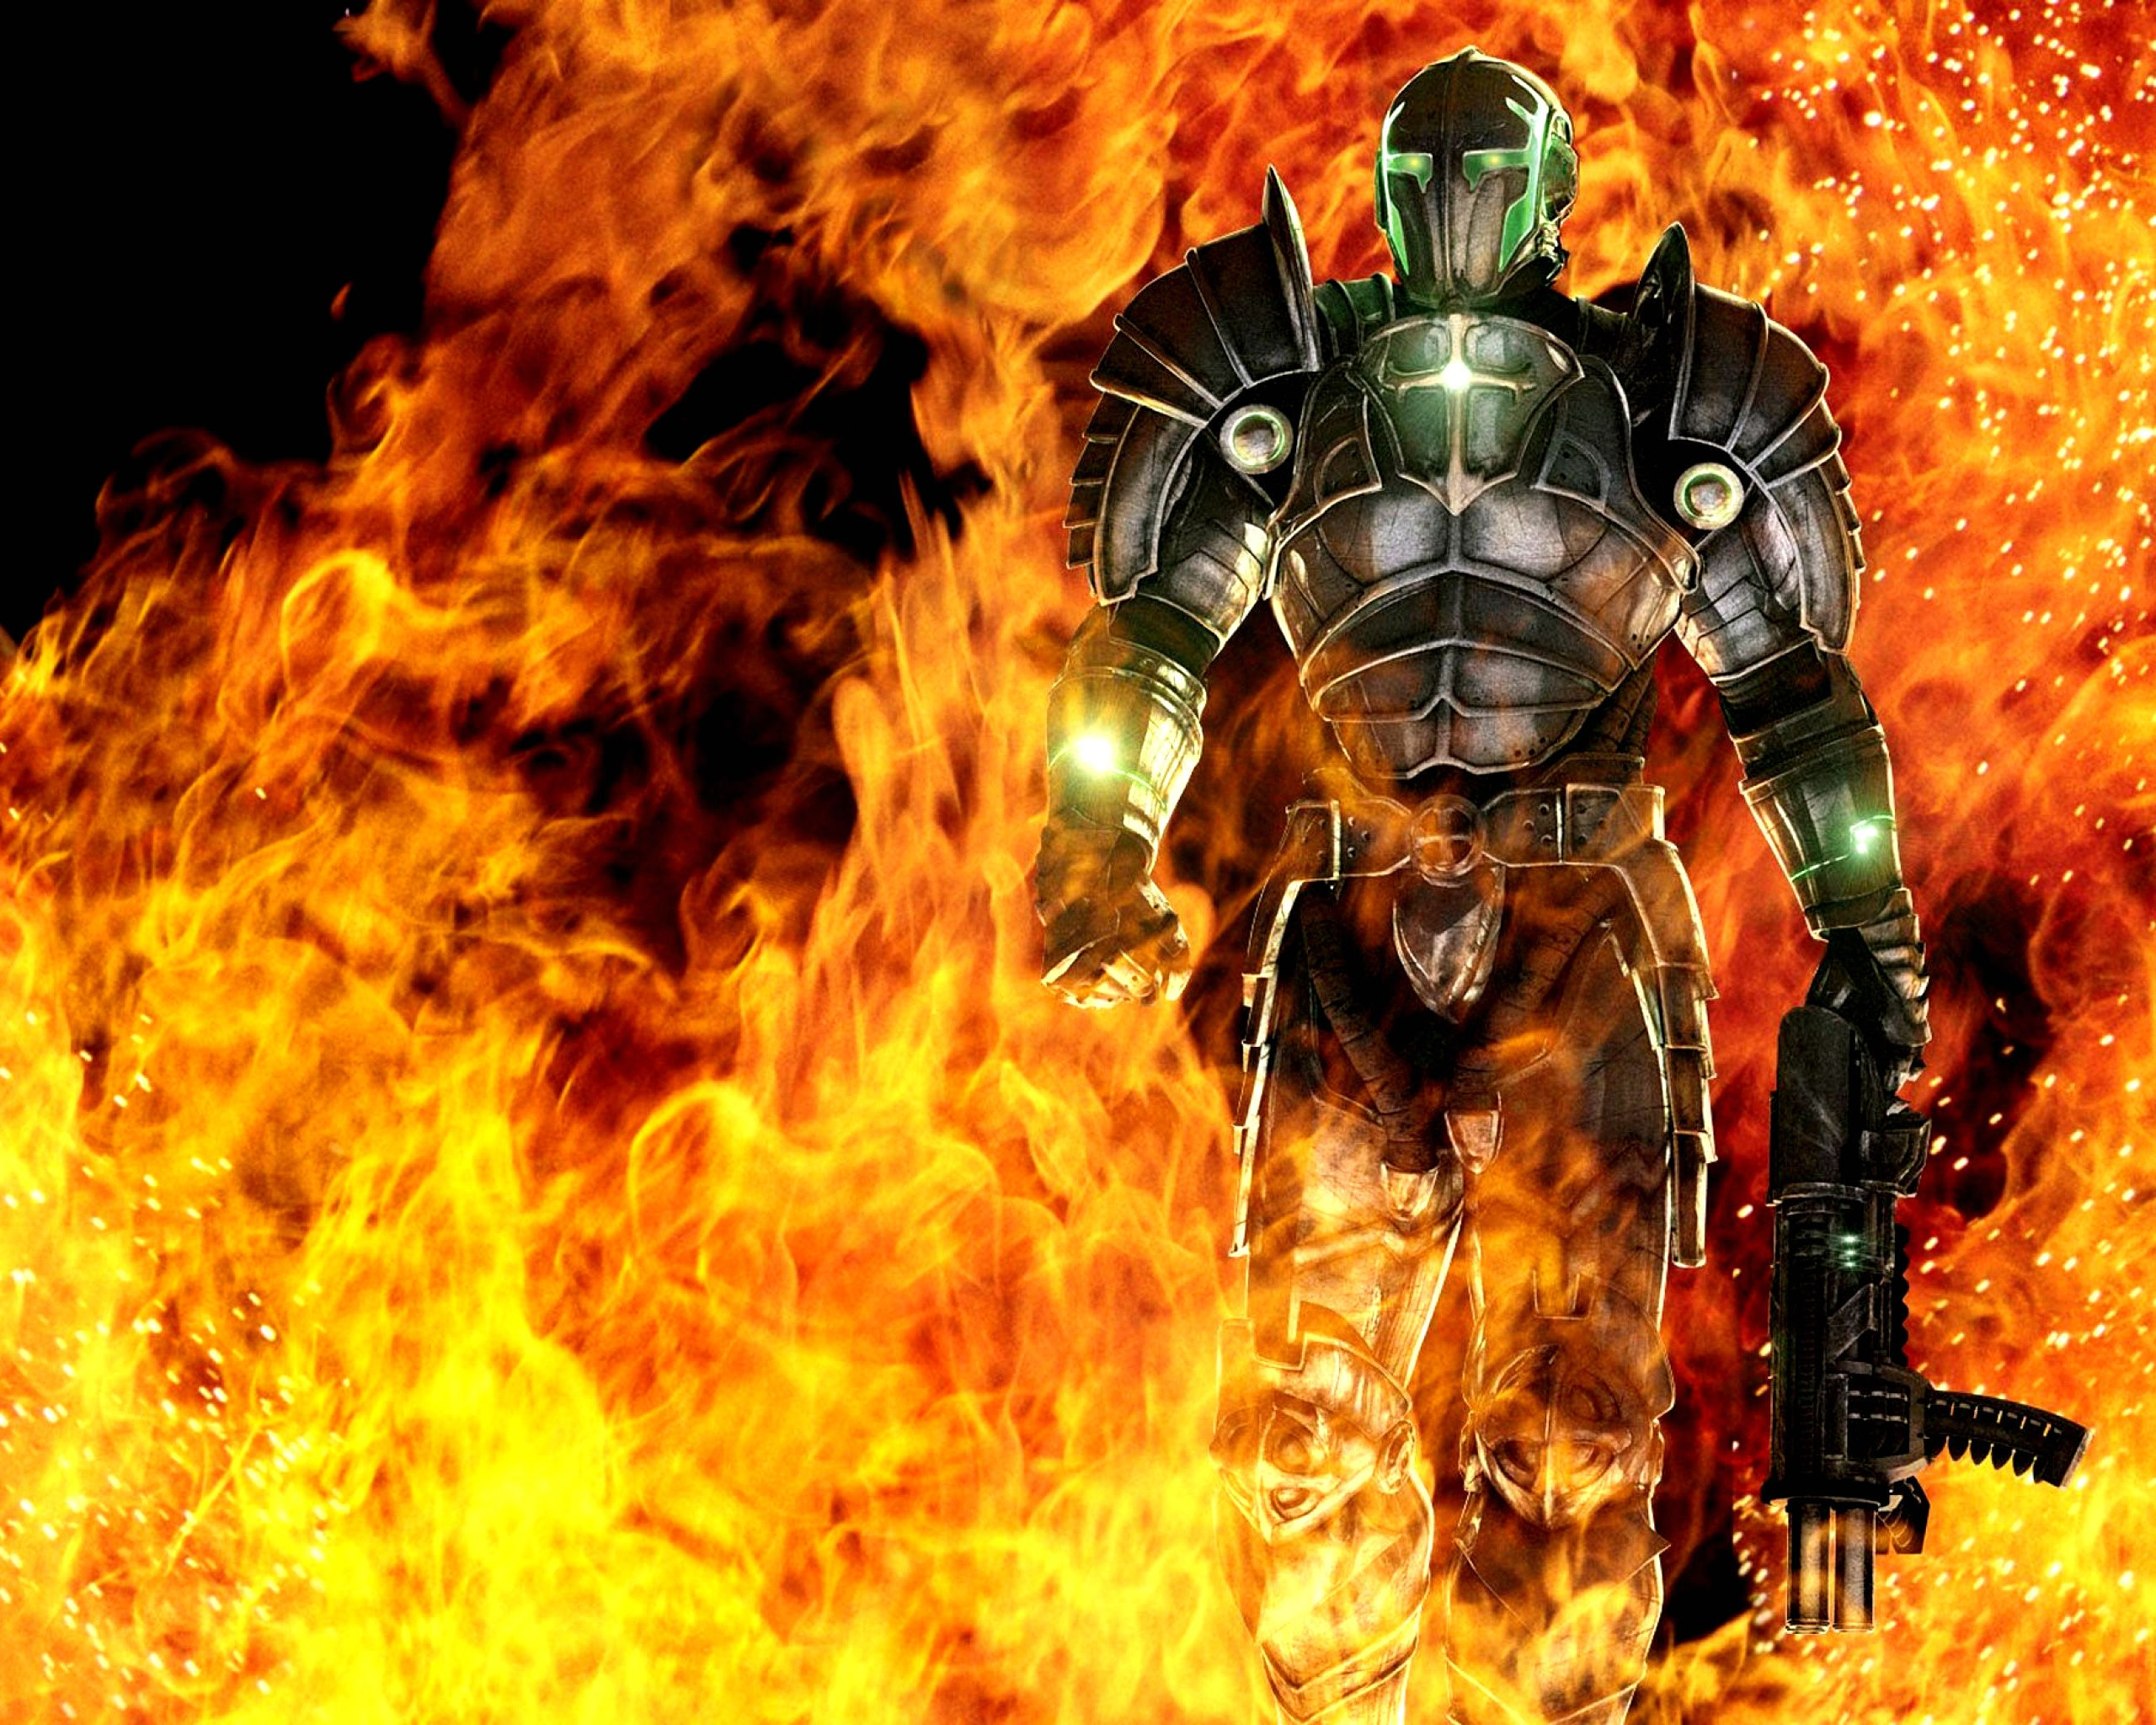 HELLGATE LONDON fantasy action sci-fi warrior fire weapon ...